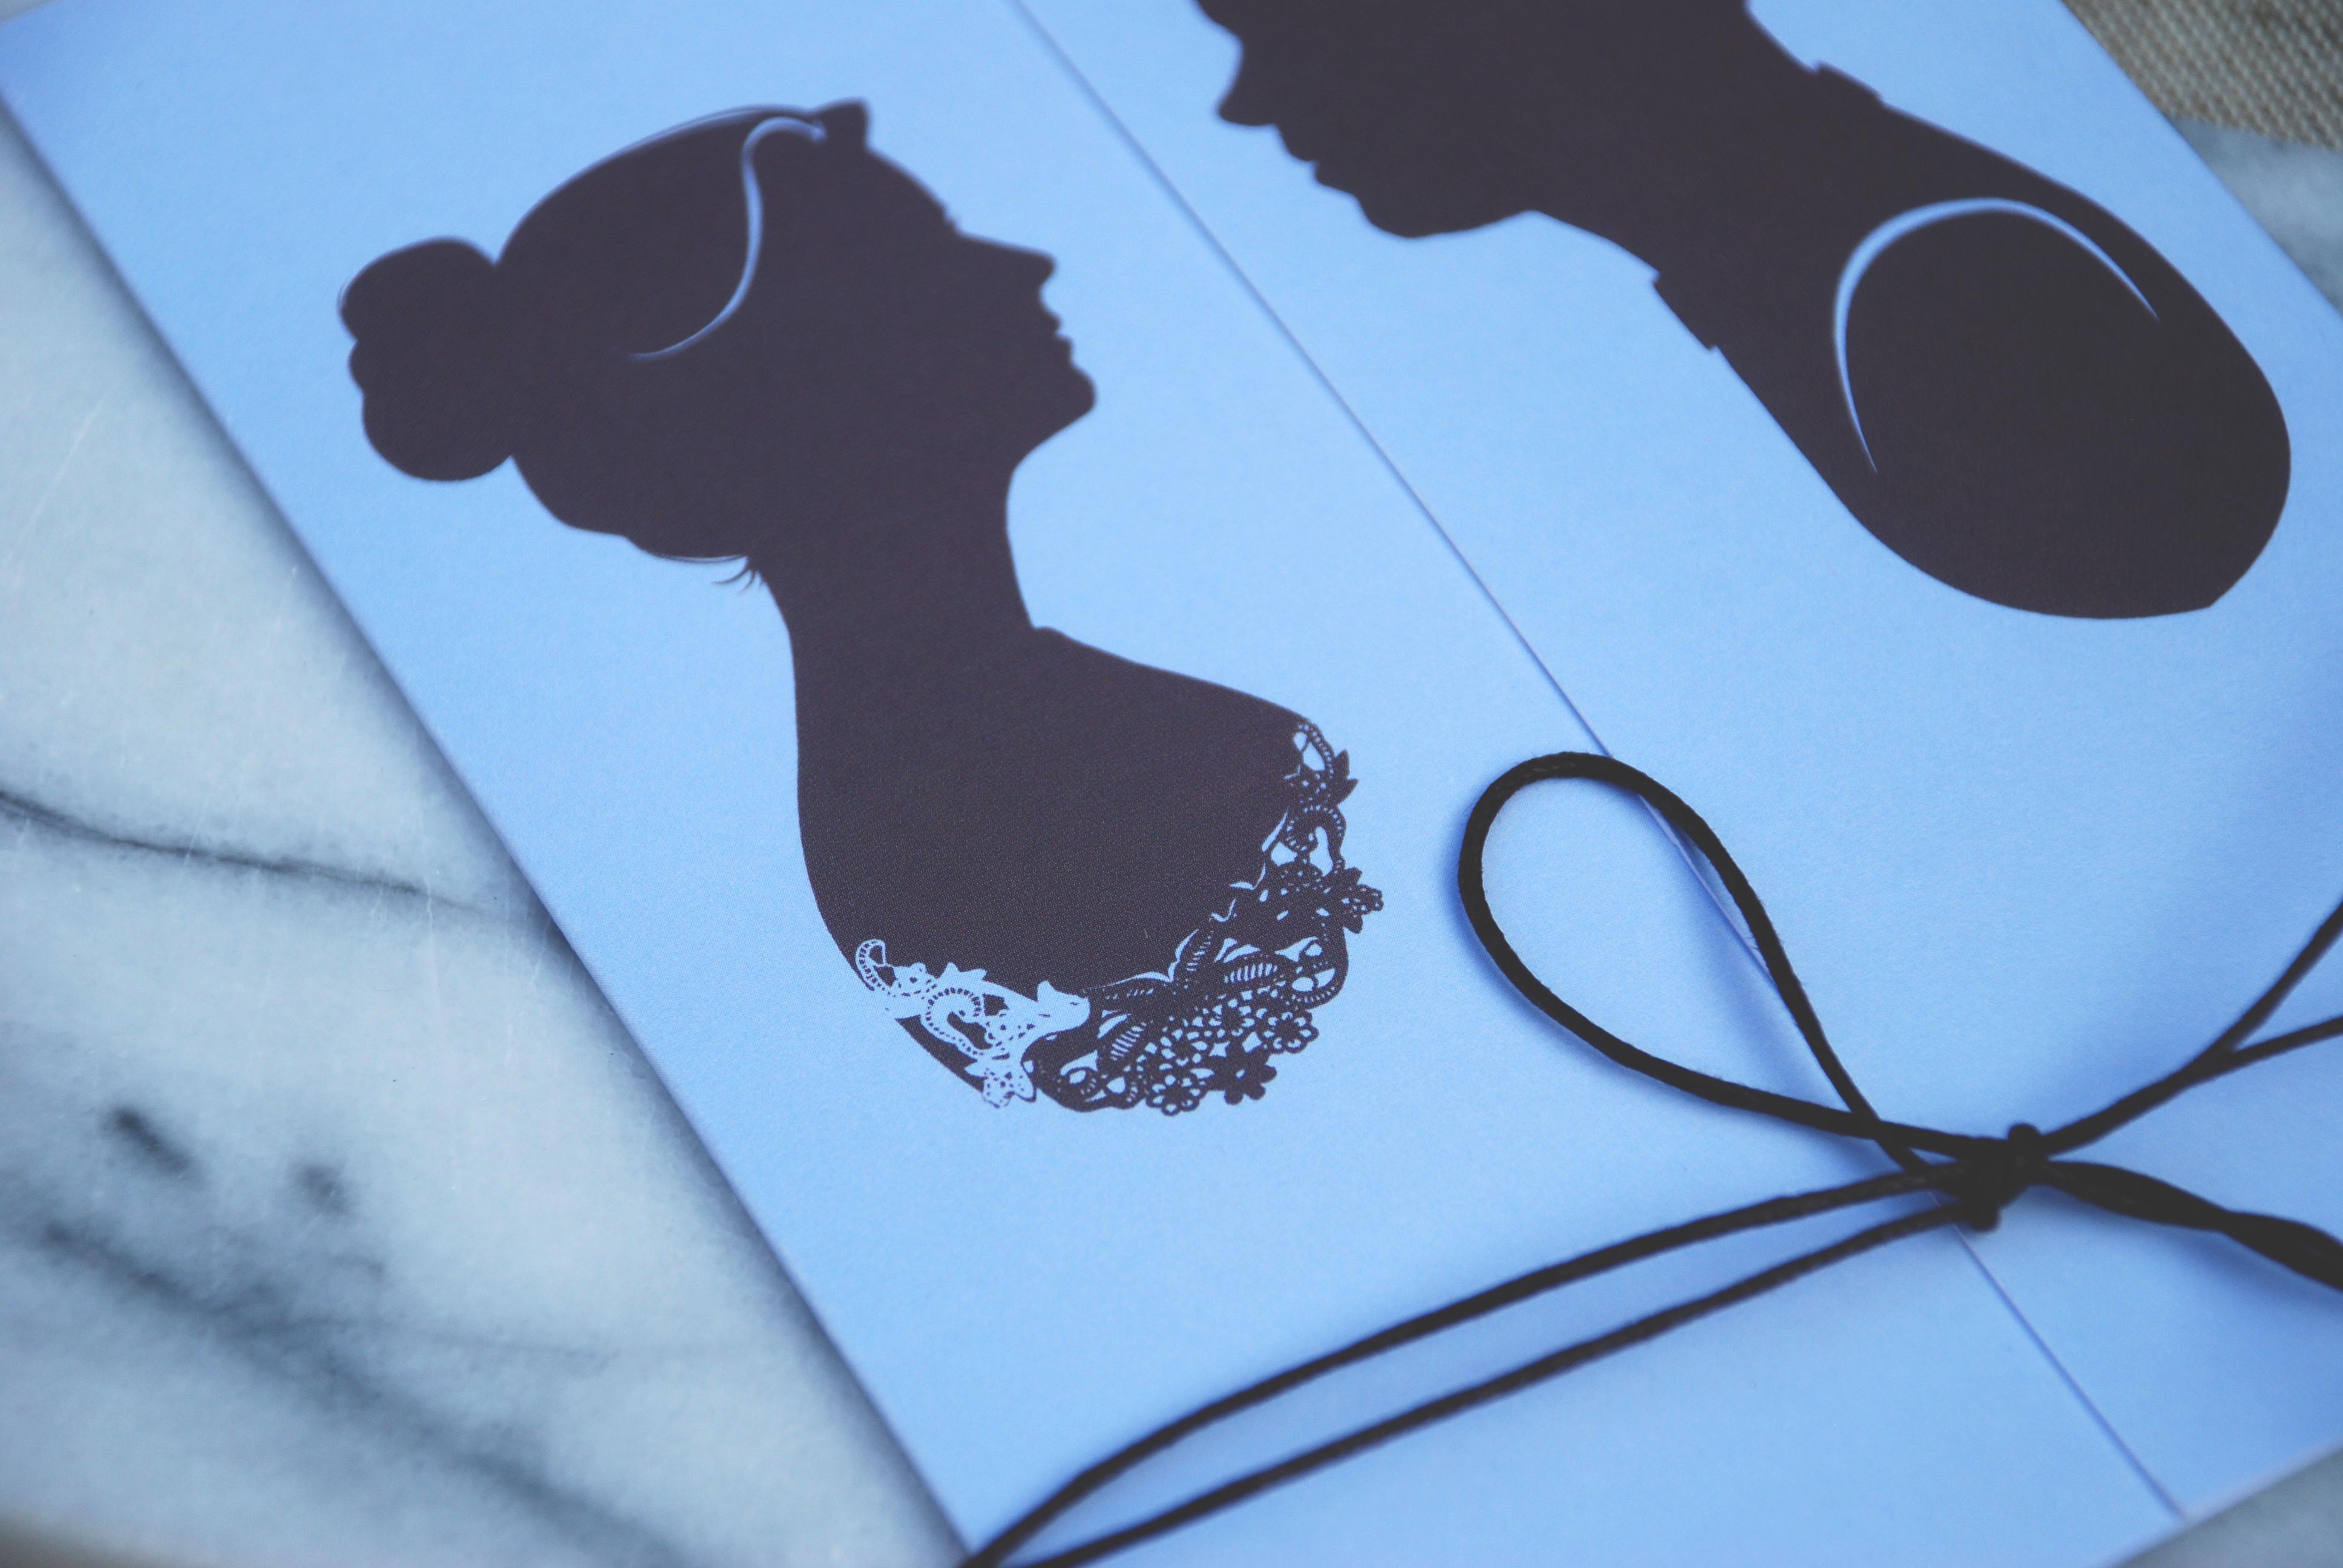 handmade silhouettes